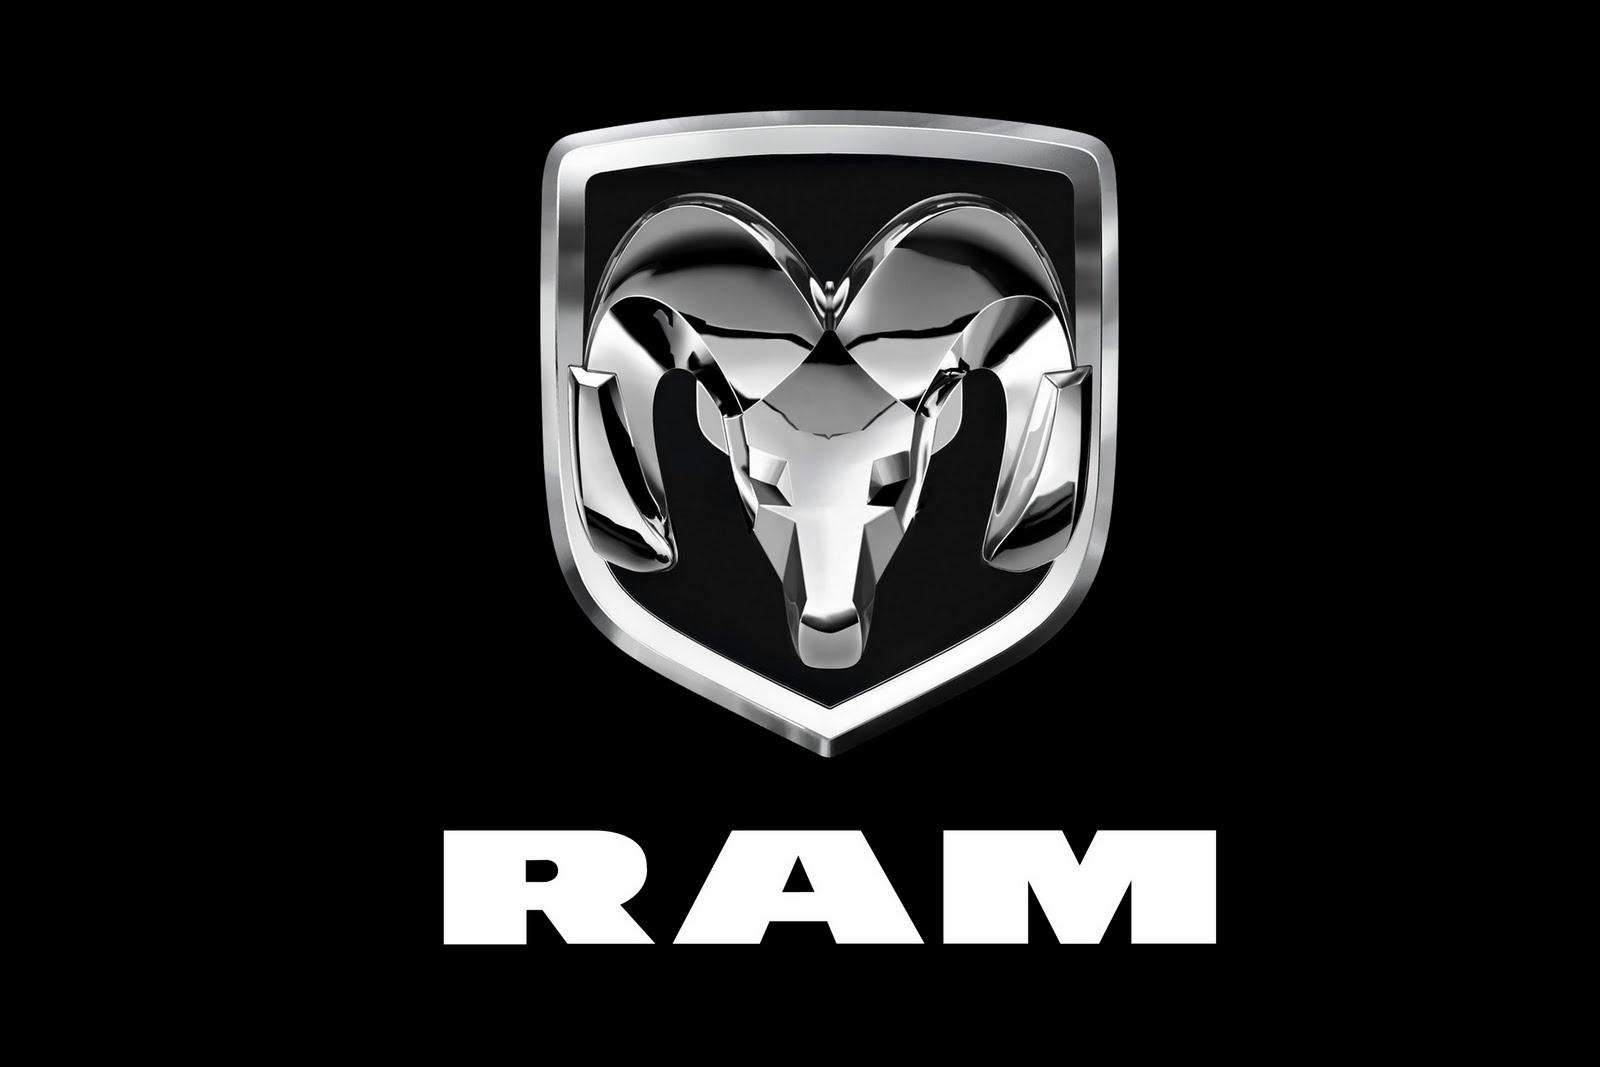 46] Dodge Ram Logo Wallpaper on WallpaperSafari 1600x1067